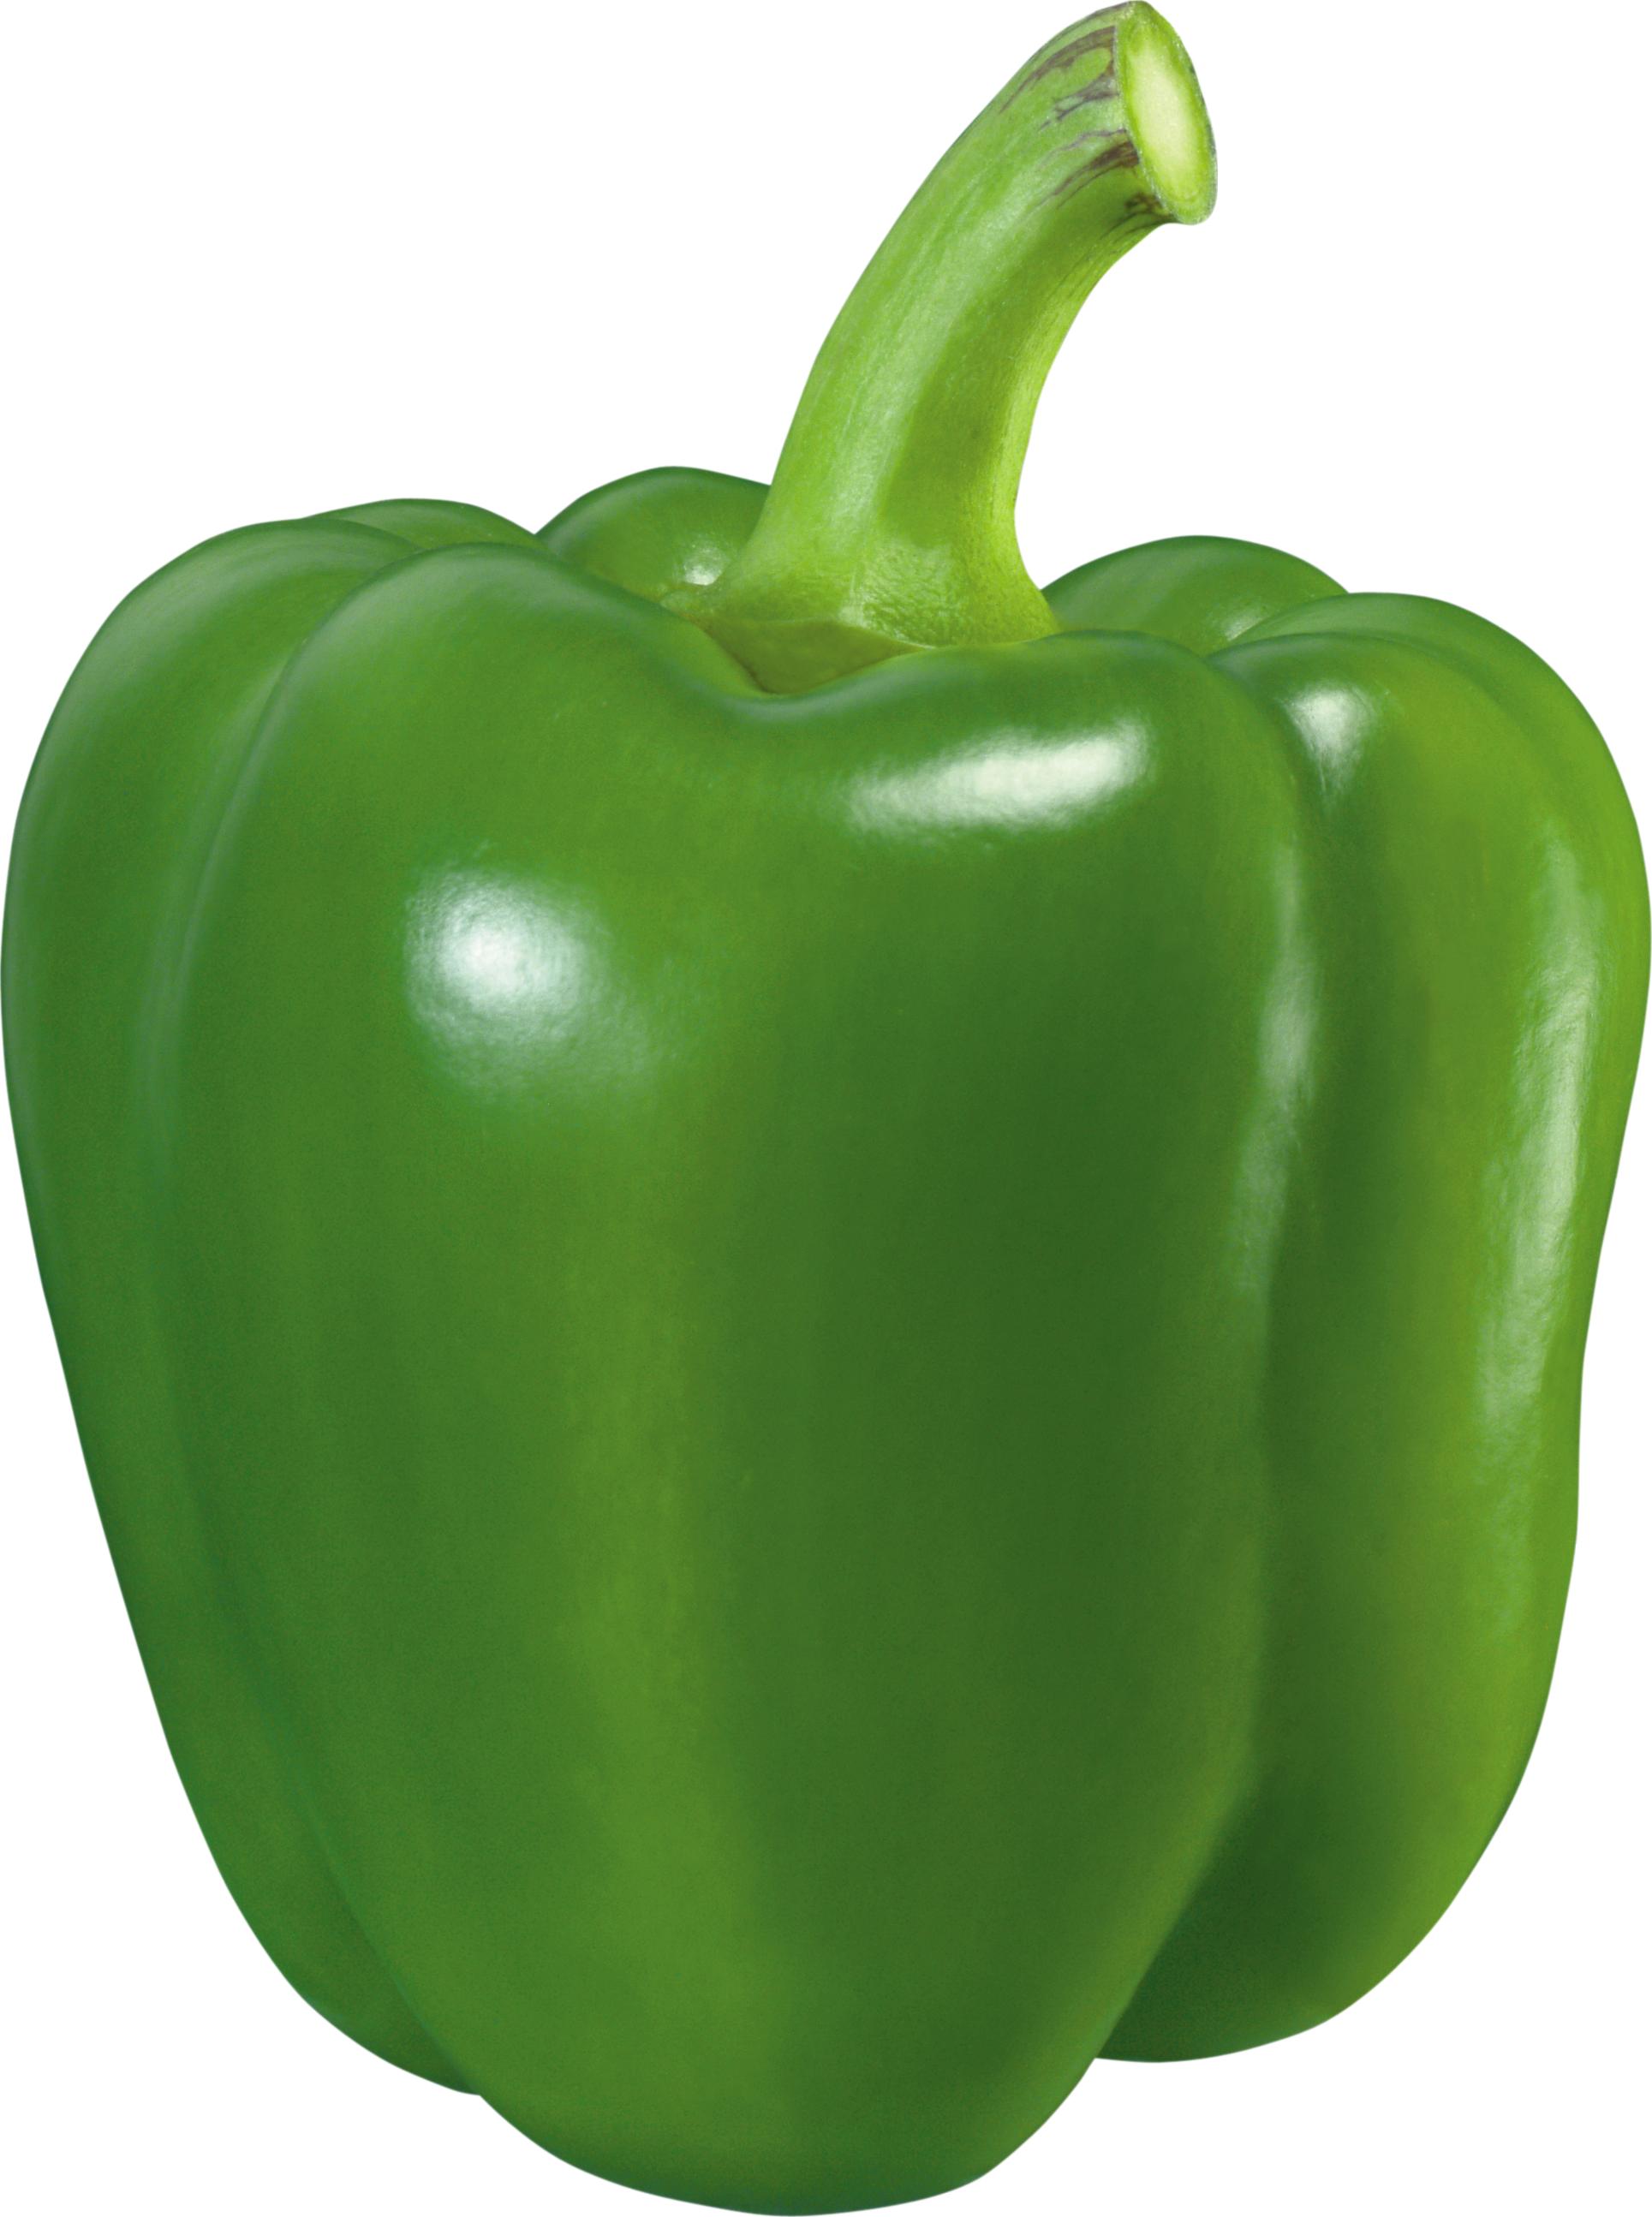 green pepper png image purepng free transparent cc0 png image